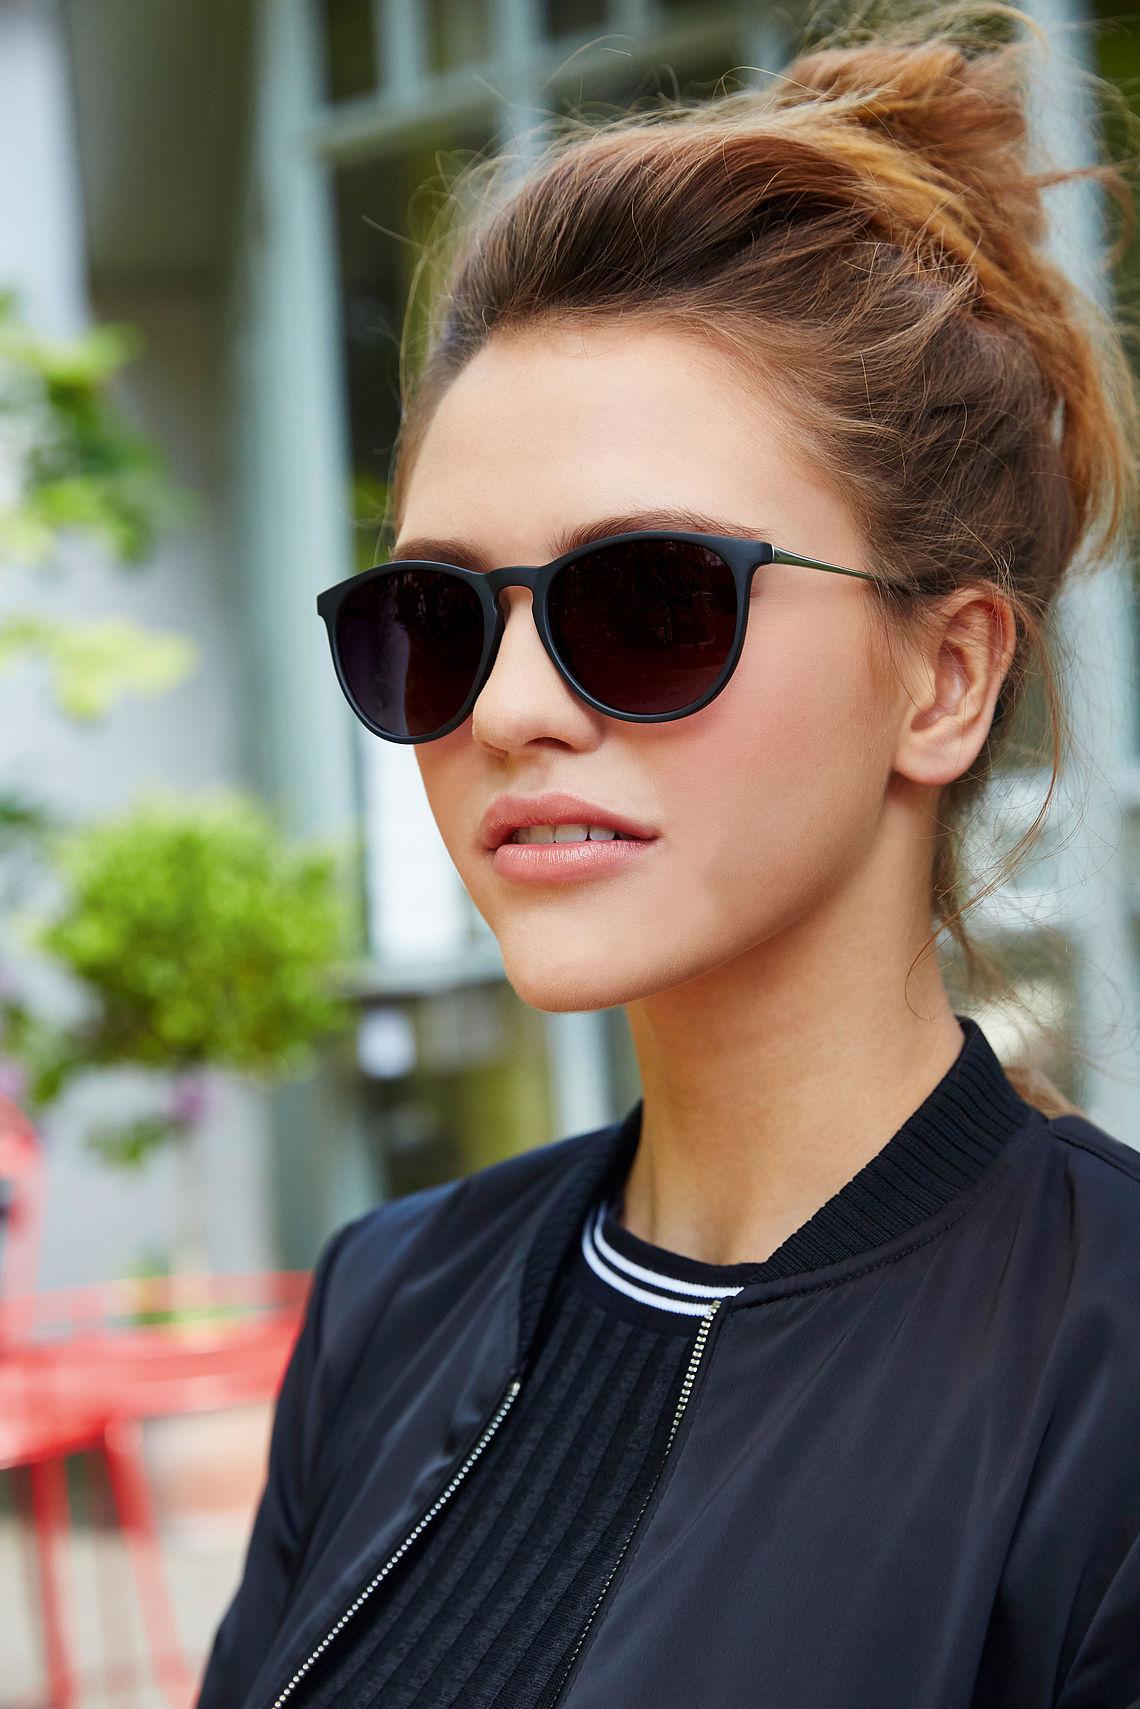 girl wearing panto sunglasses